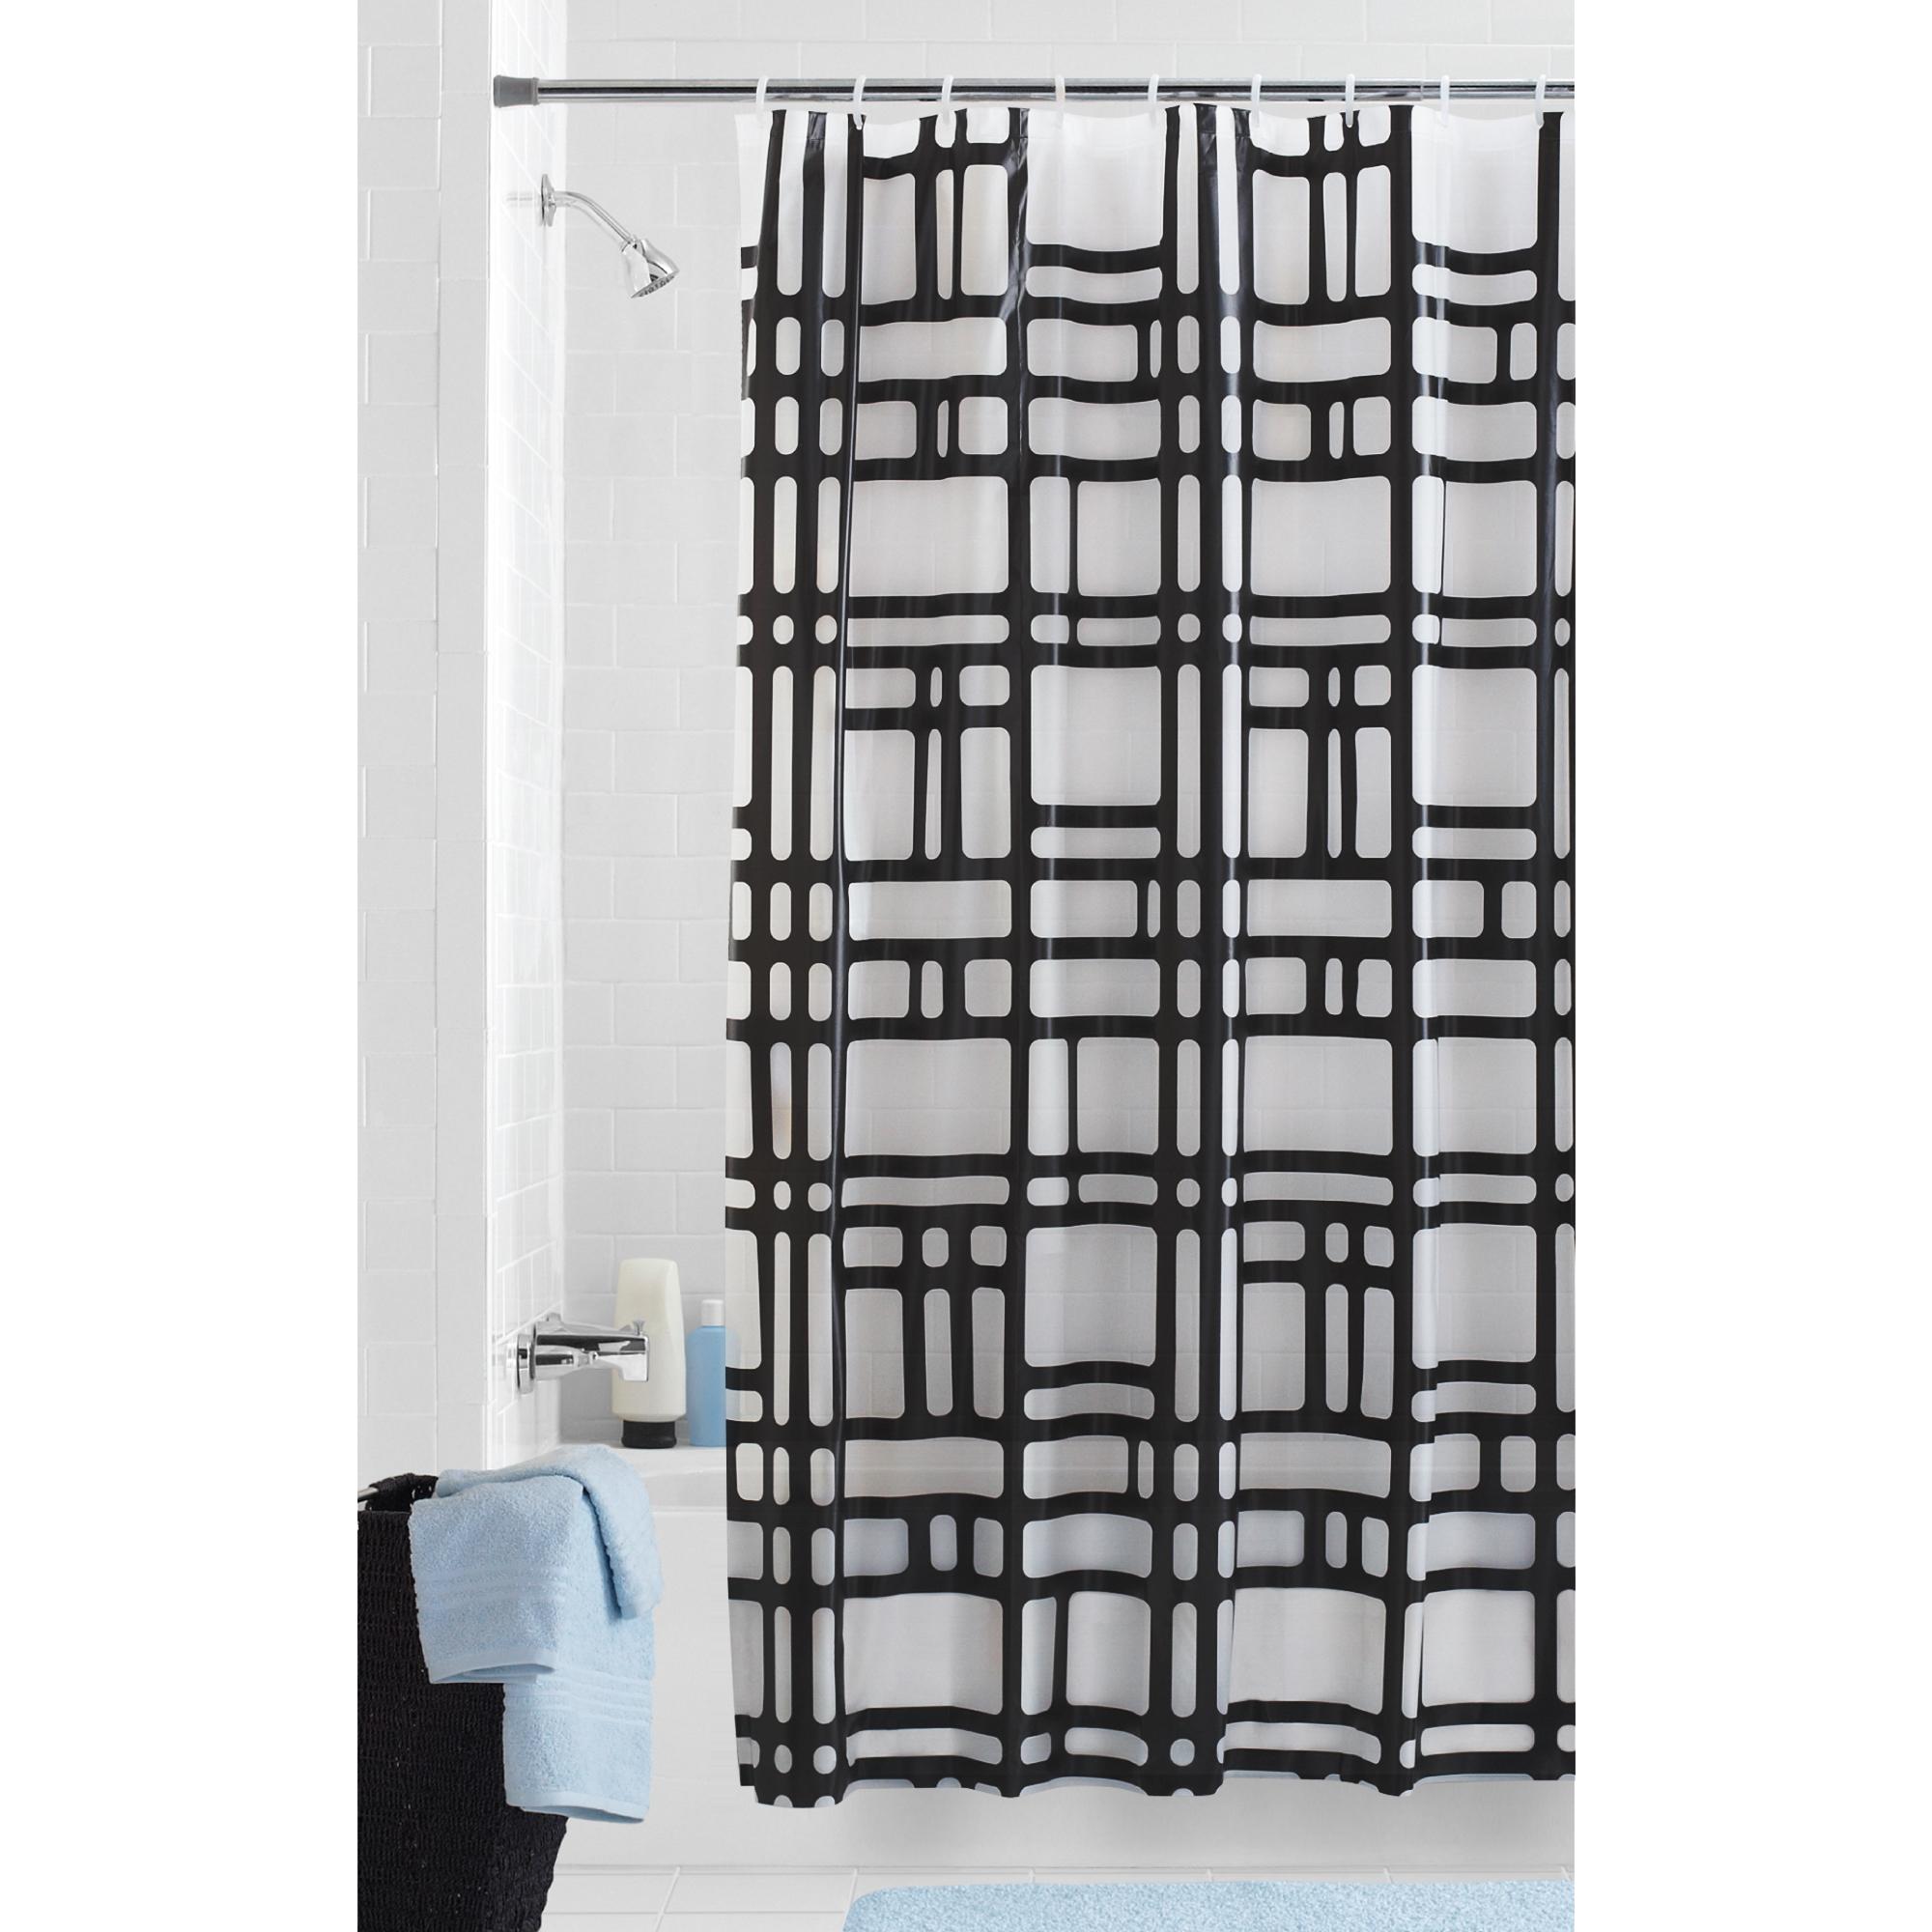 Mainstays Elements Geometric PEVA Shower Curtain